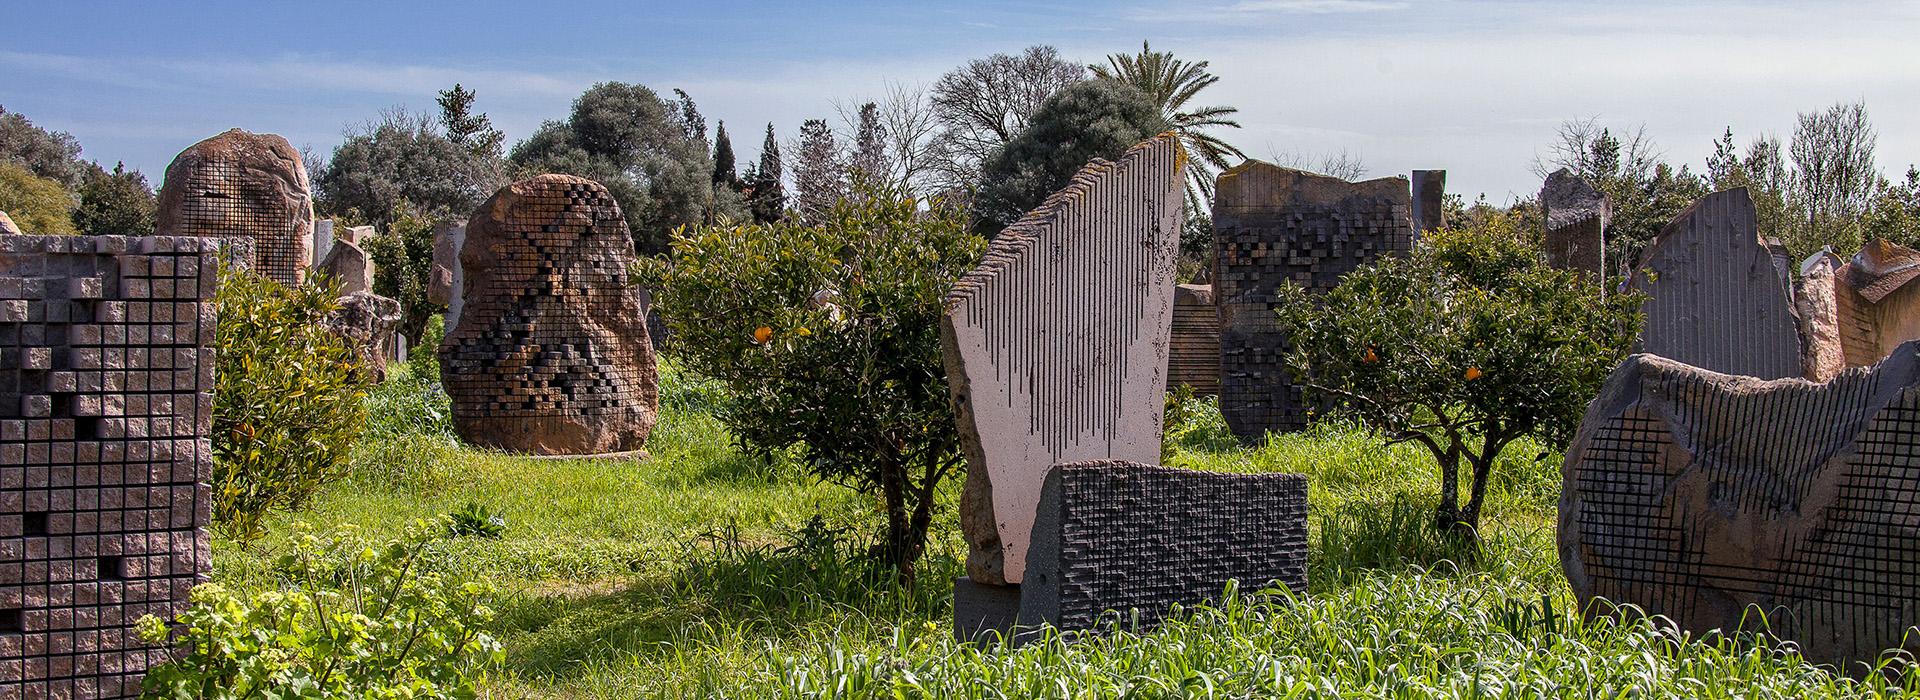 Abercrombie & Kent Pinuccio Sciola sound garden